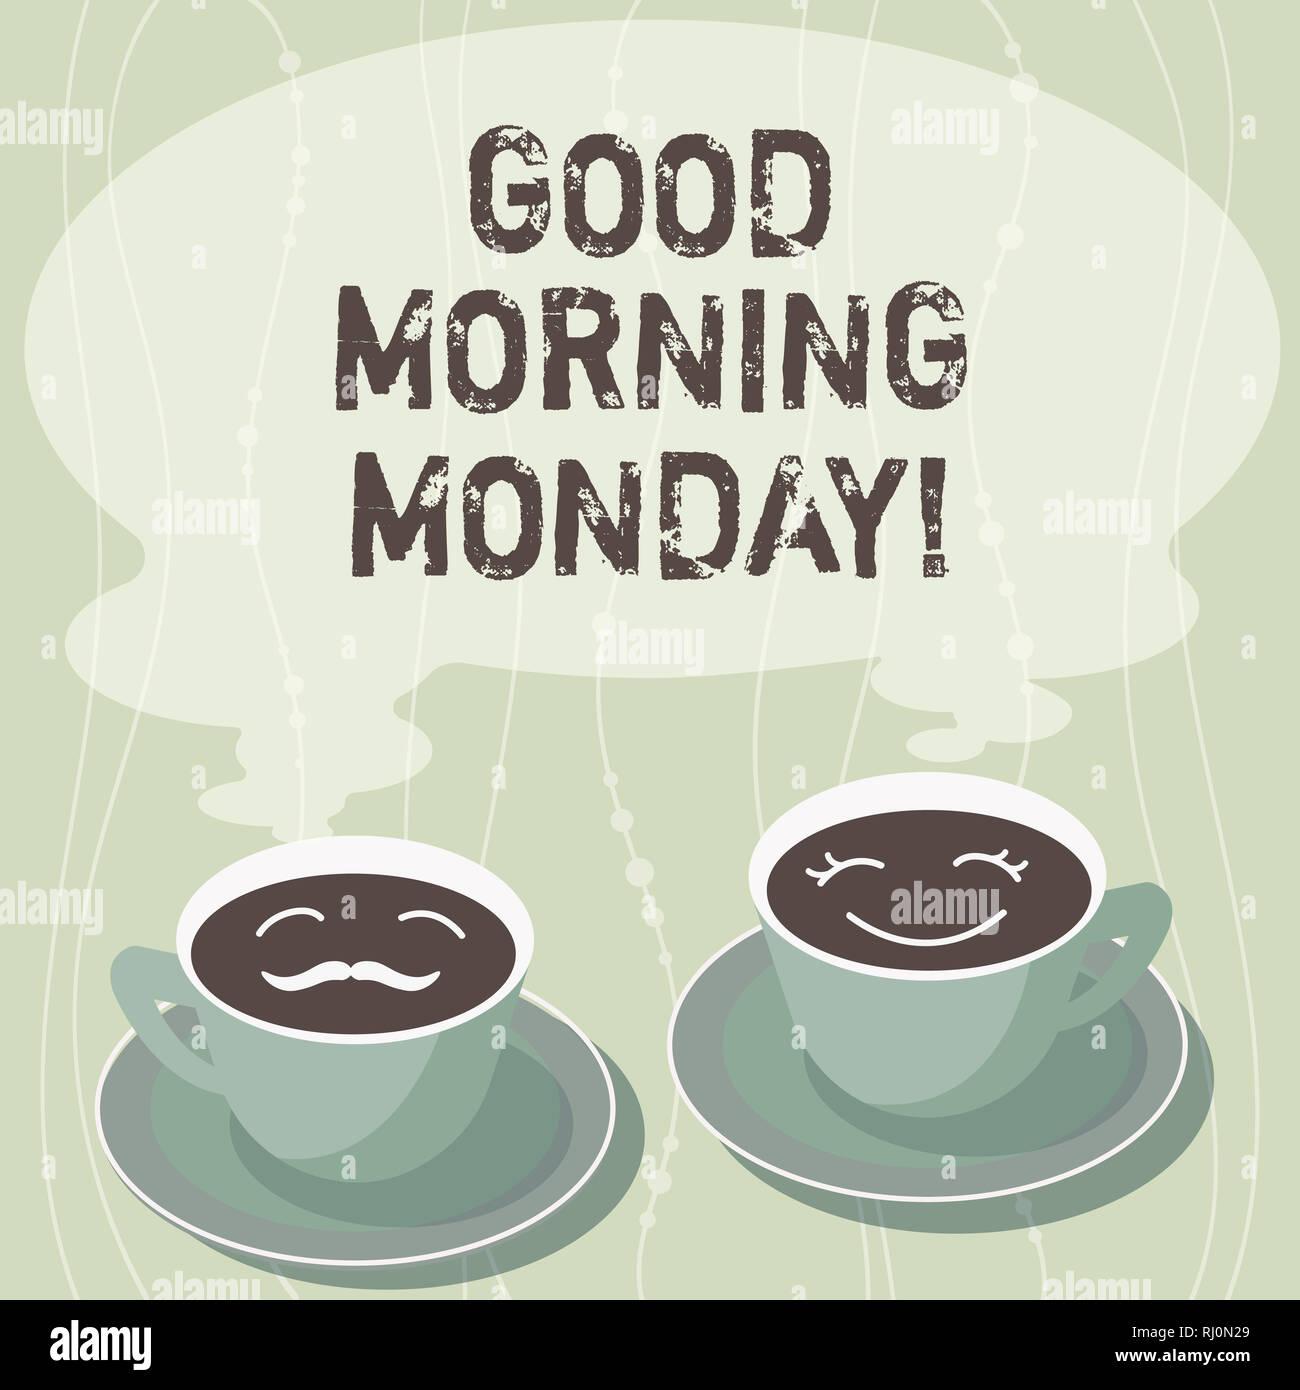 Handschrift Text Schreiben Guten Morgen Montag Konzept Sinn